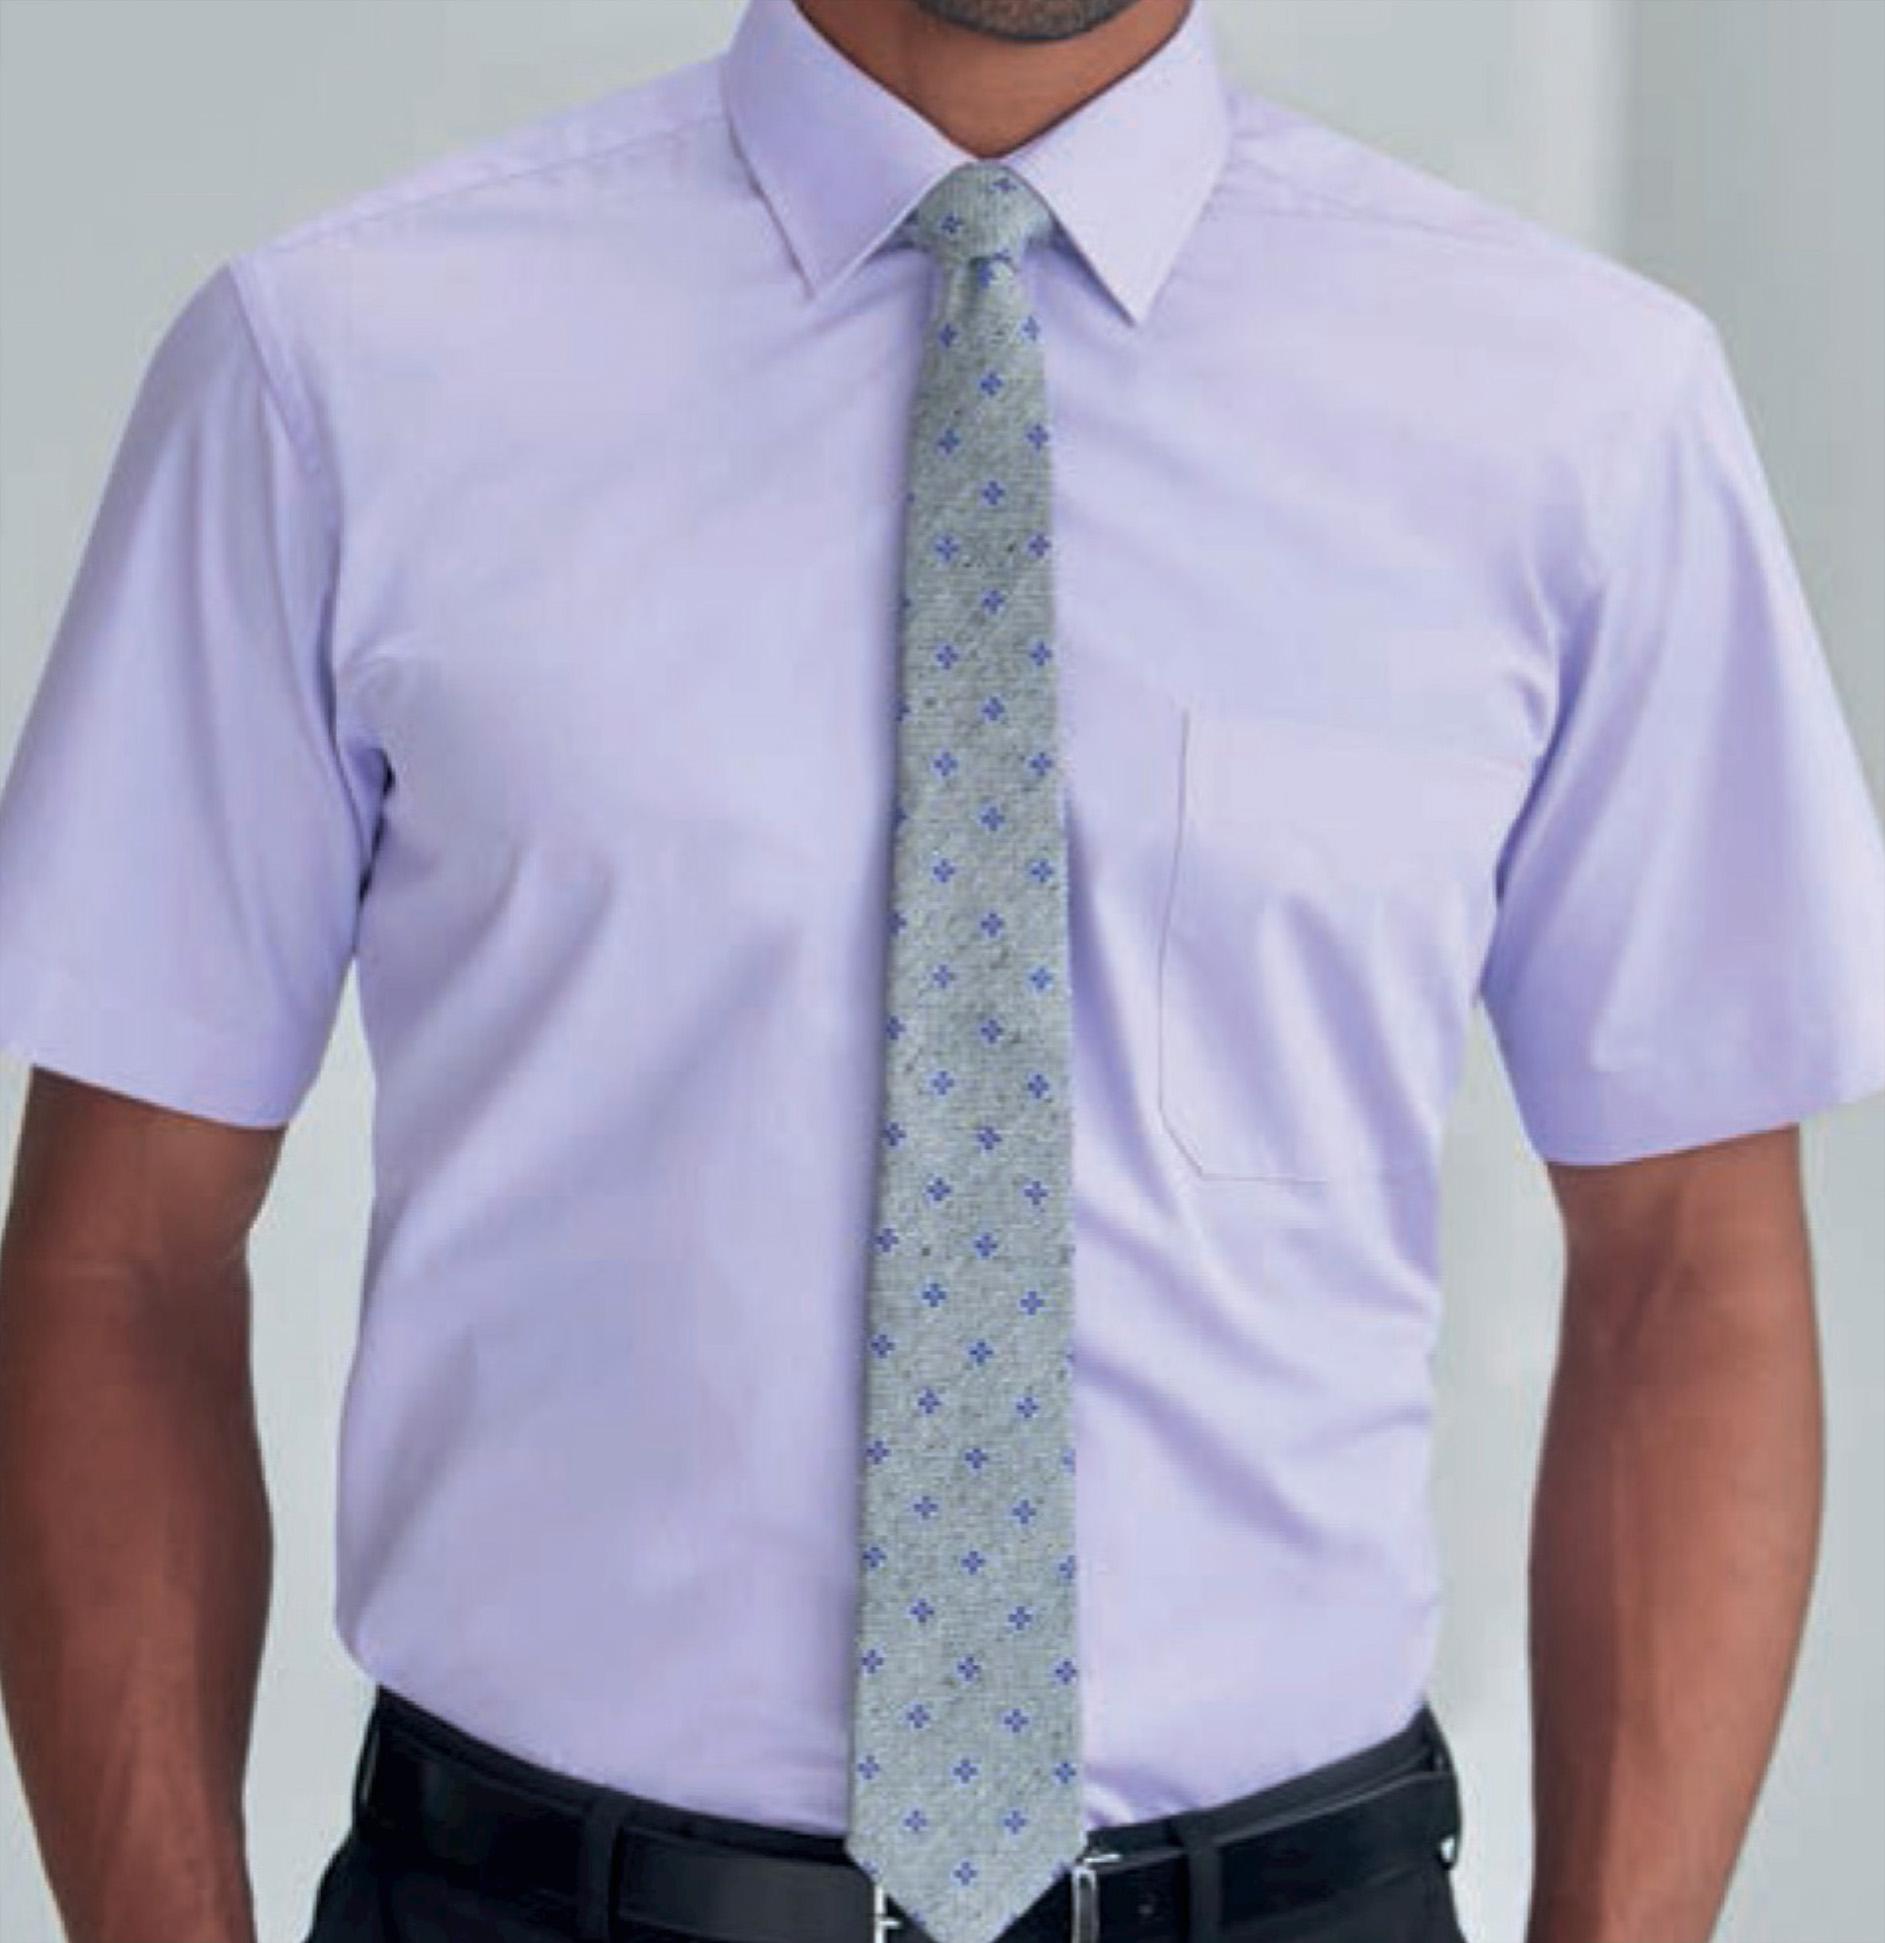 man_shirt_blouse_collection